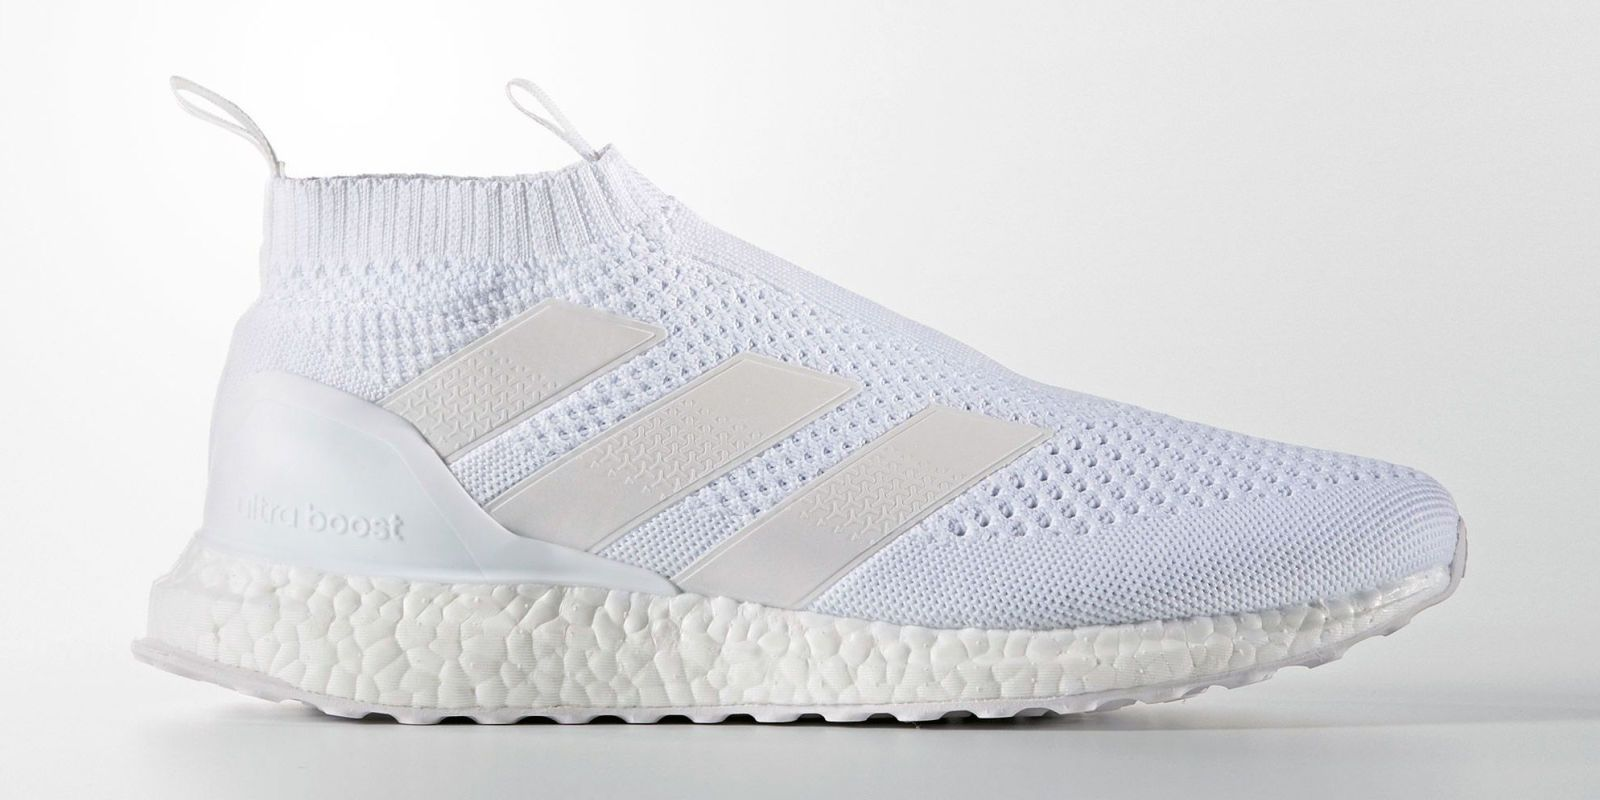 adidas Ultra Boost uncaged on feet pics via BSTN | Dead Stock